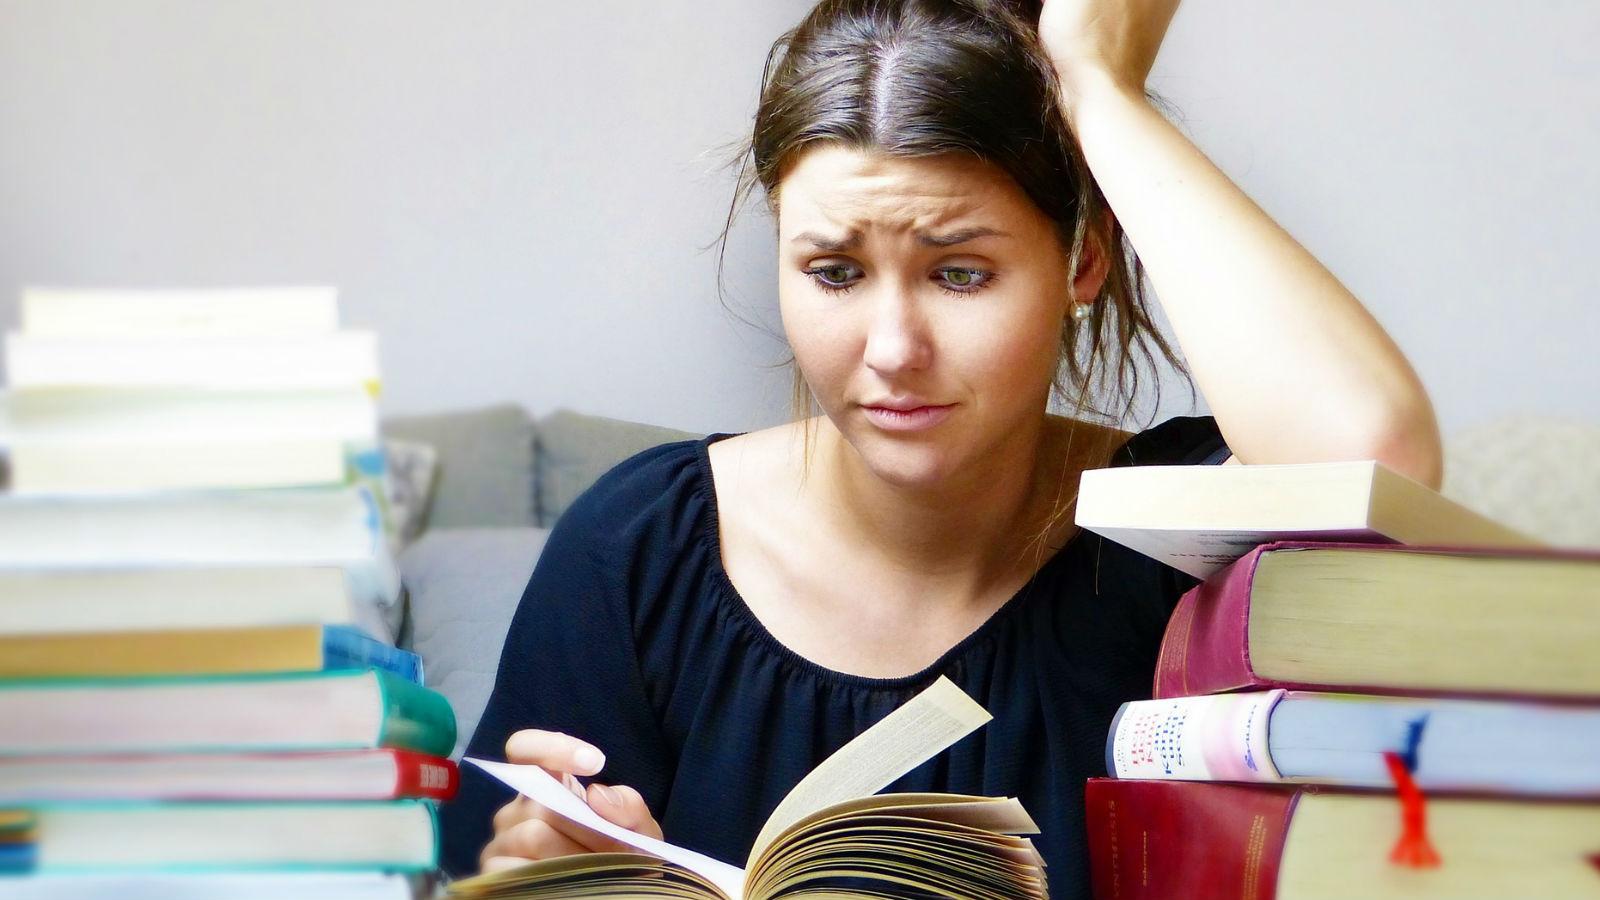 7 formas de aliviar el estrés